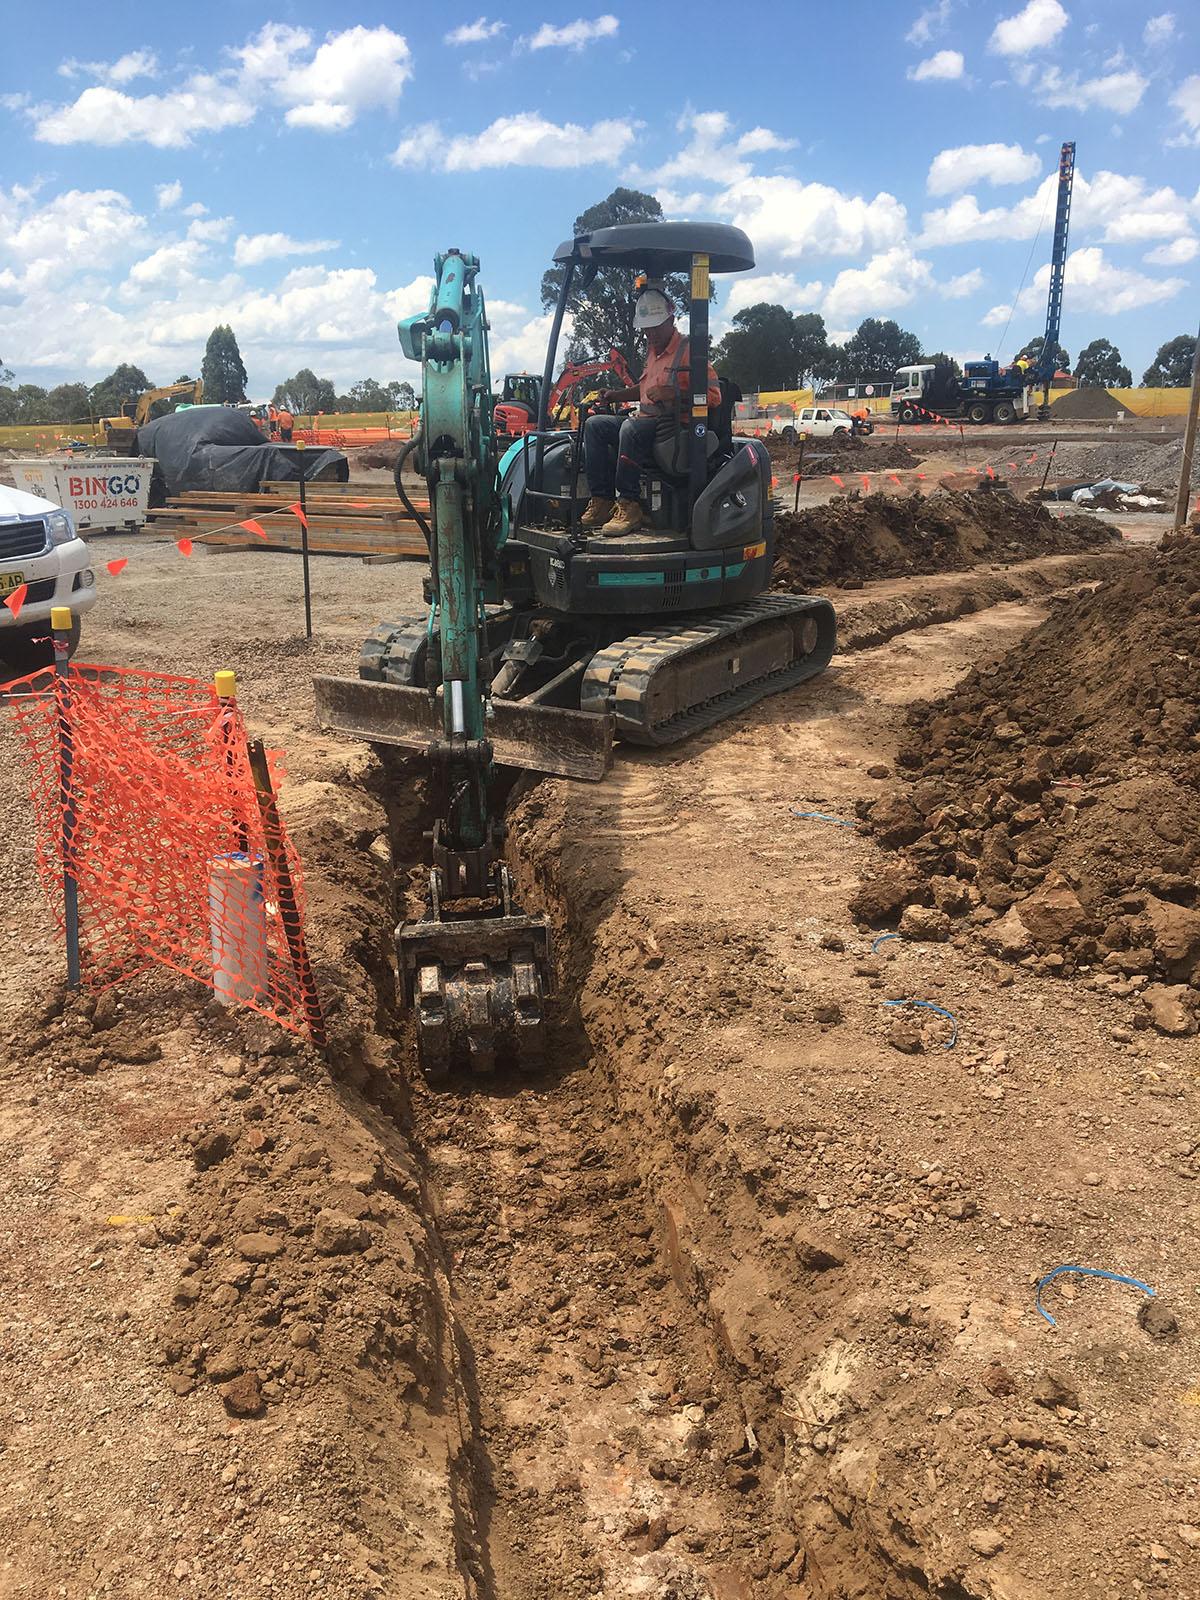 Excavator with Bucket attachment